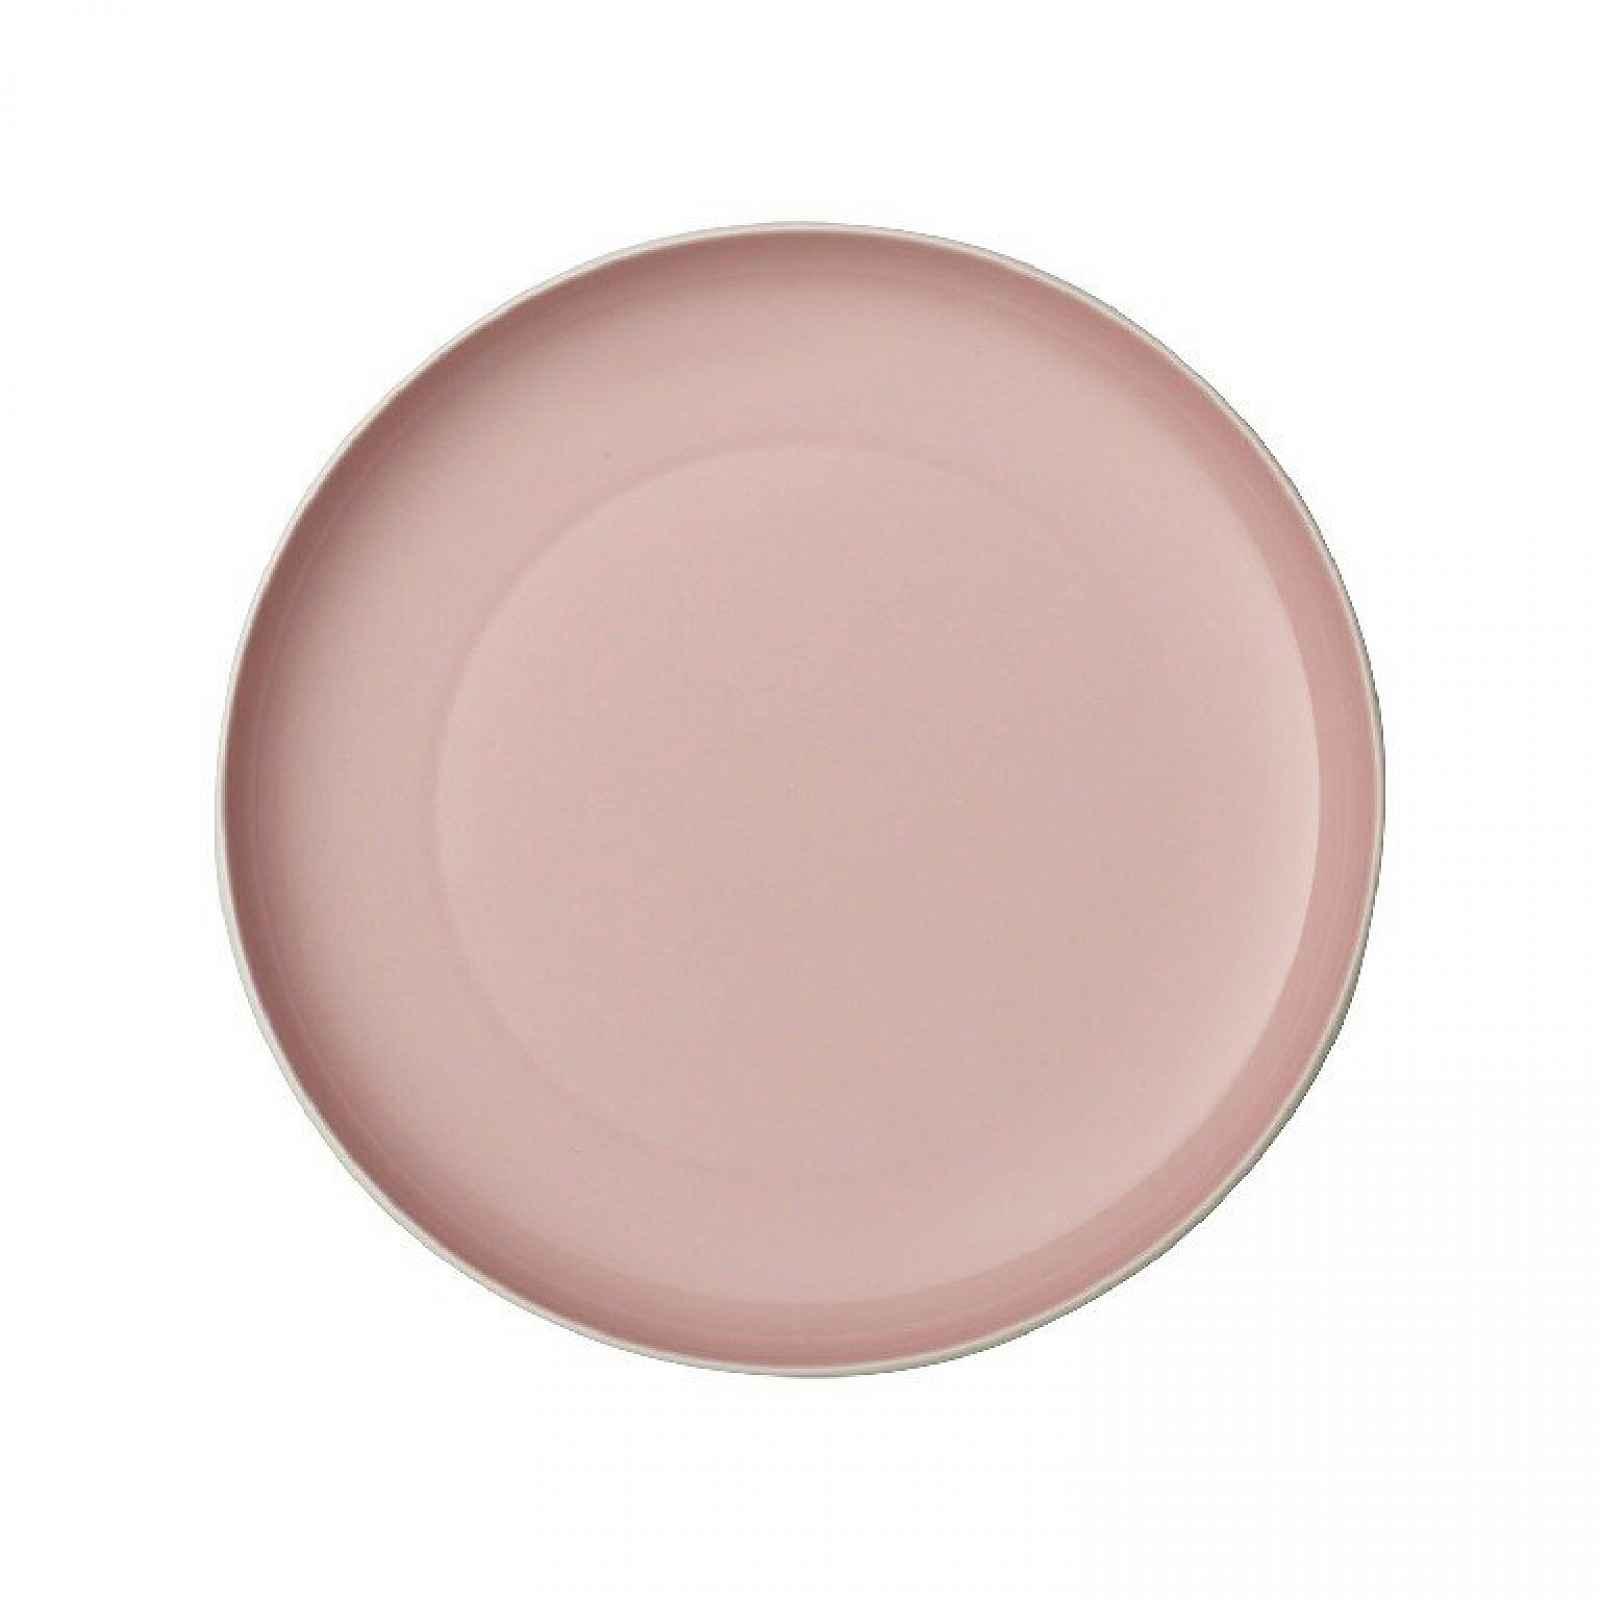 Bílo-růžový porcelánový talíř Villeroy & Boch Uni, ⌀ 24 cm